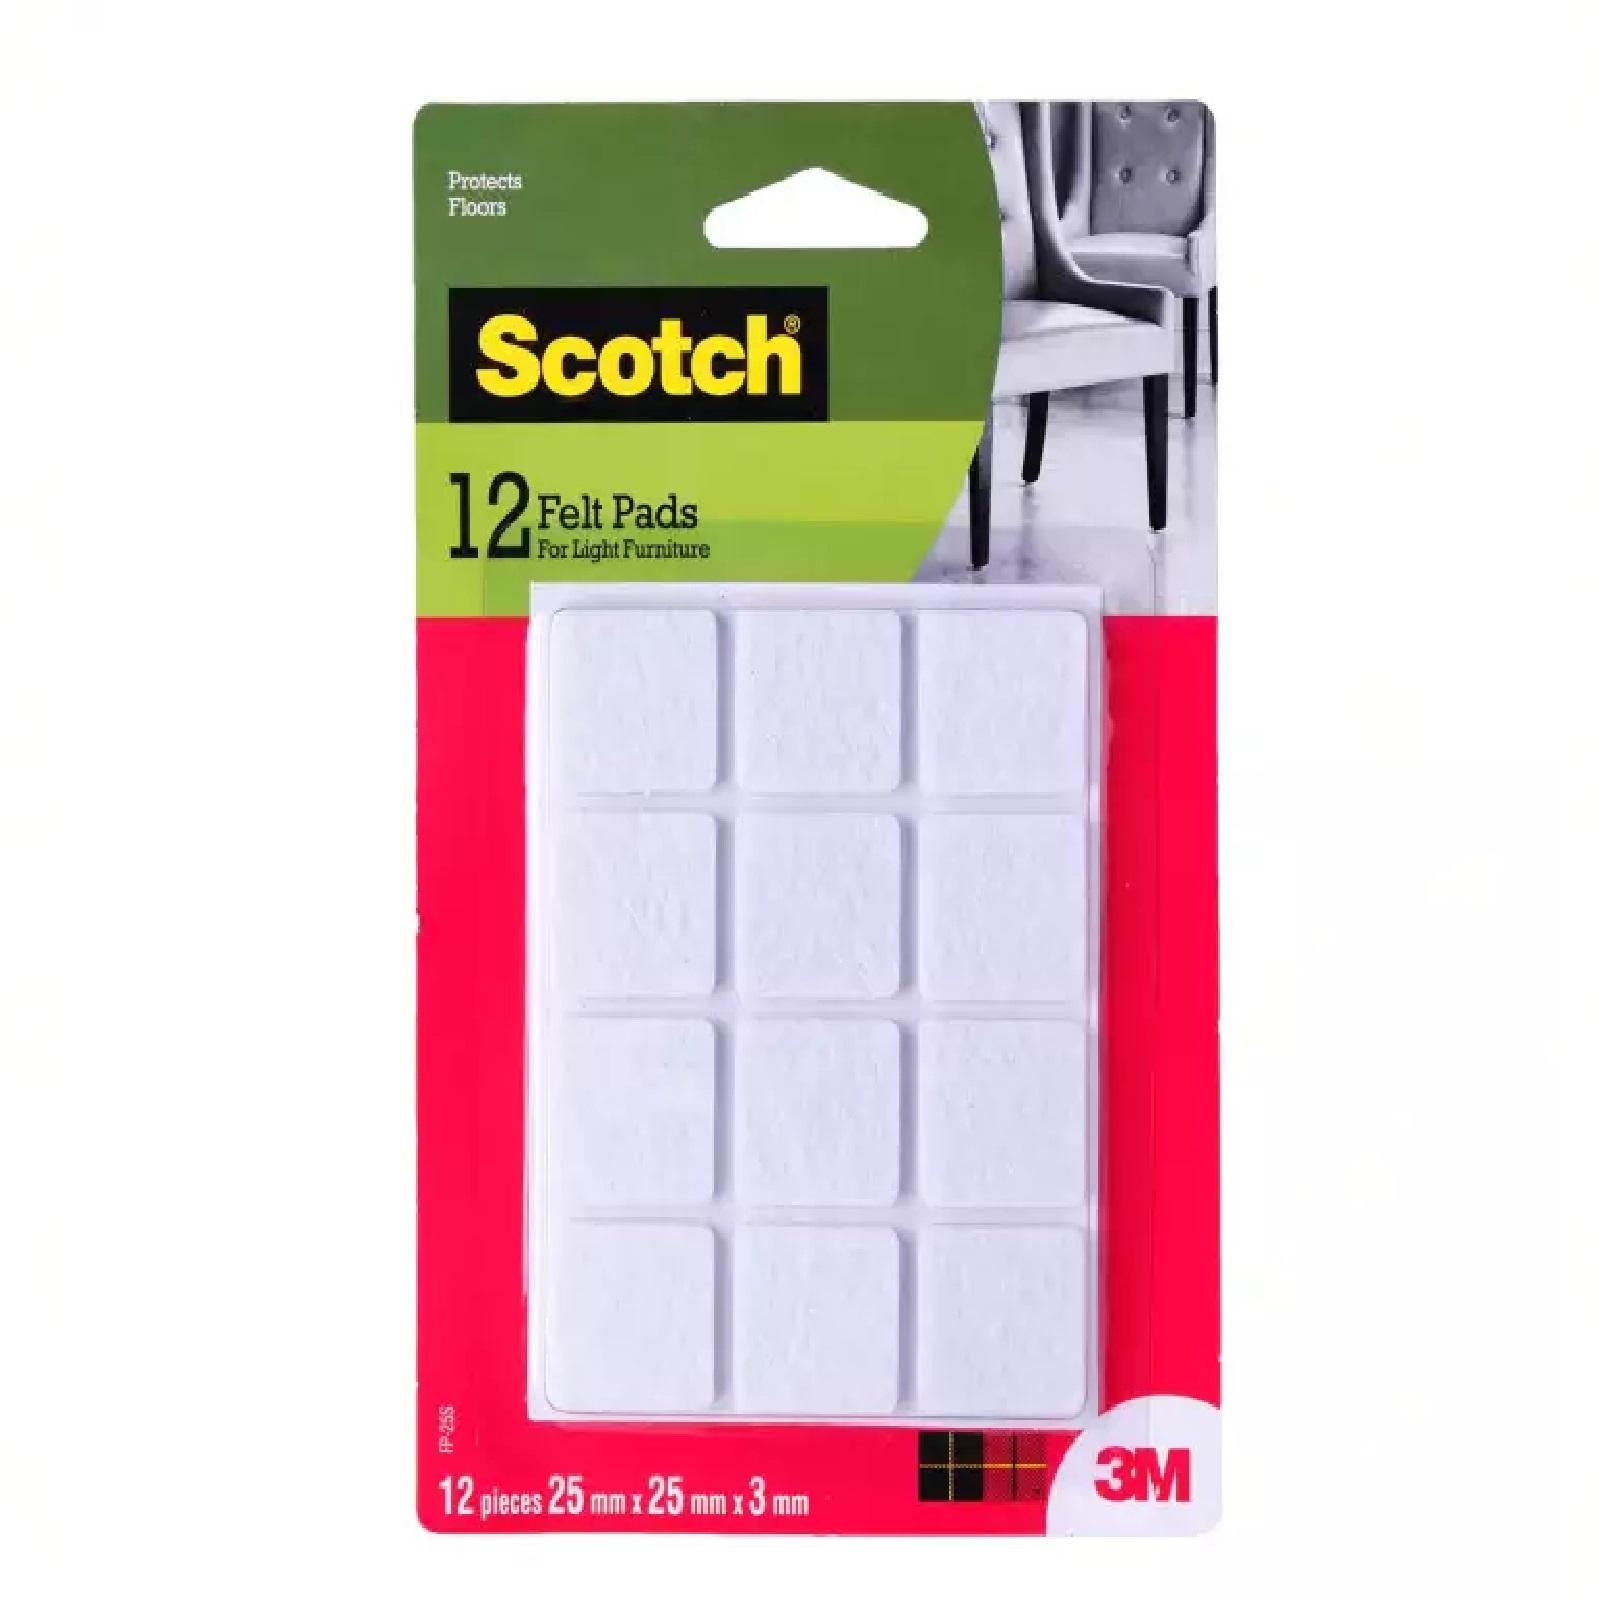 3M Scotch Felt Pad Square 25MM X 25MM 12PC/Pack